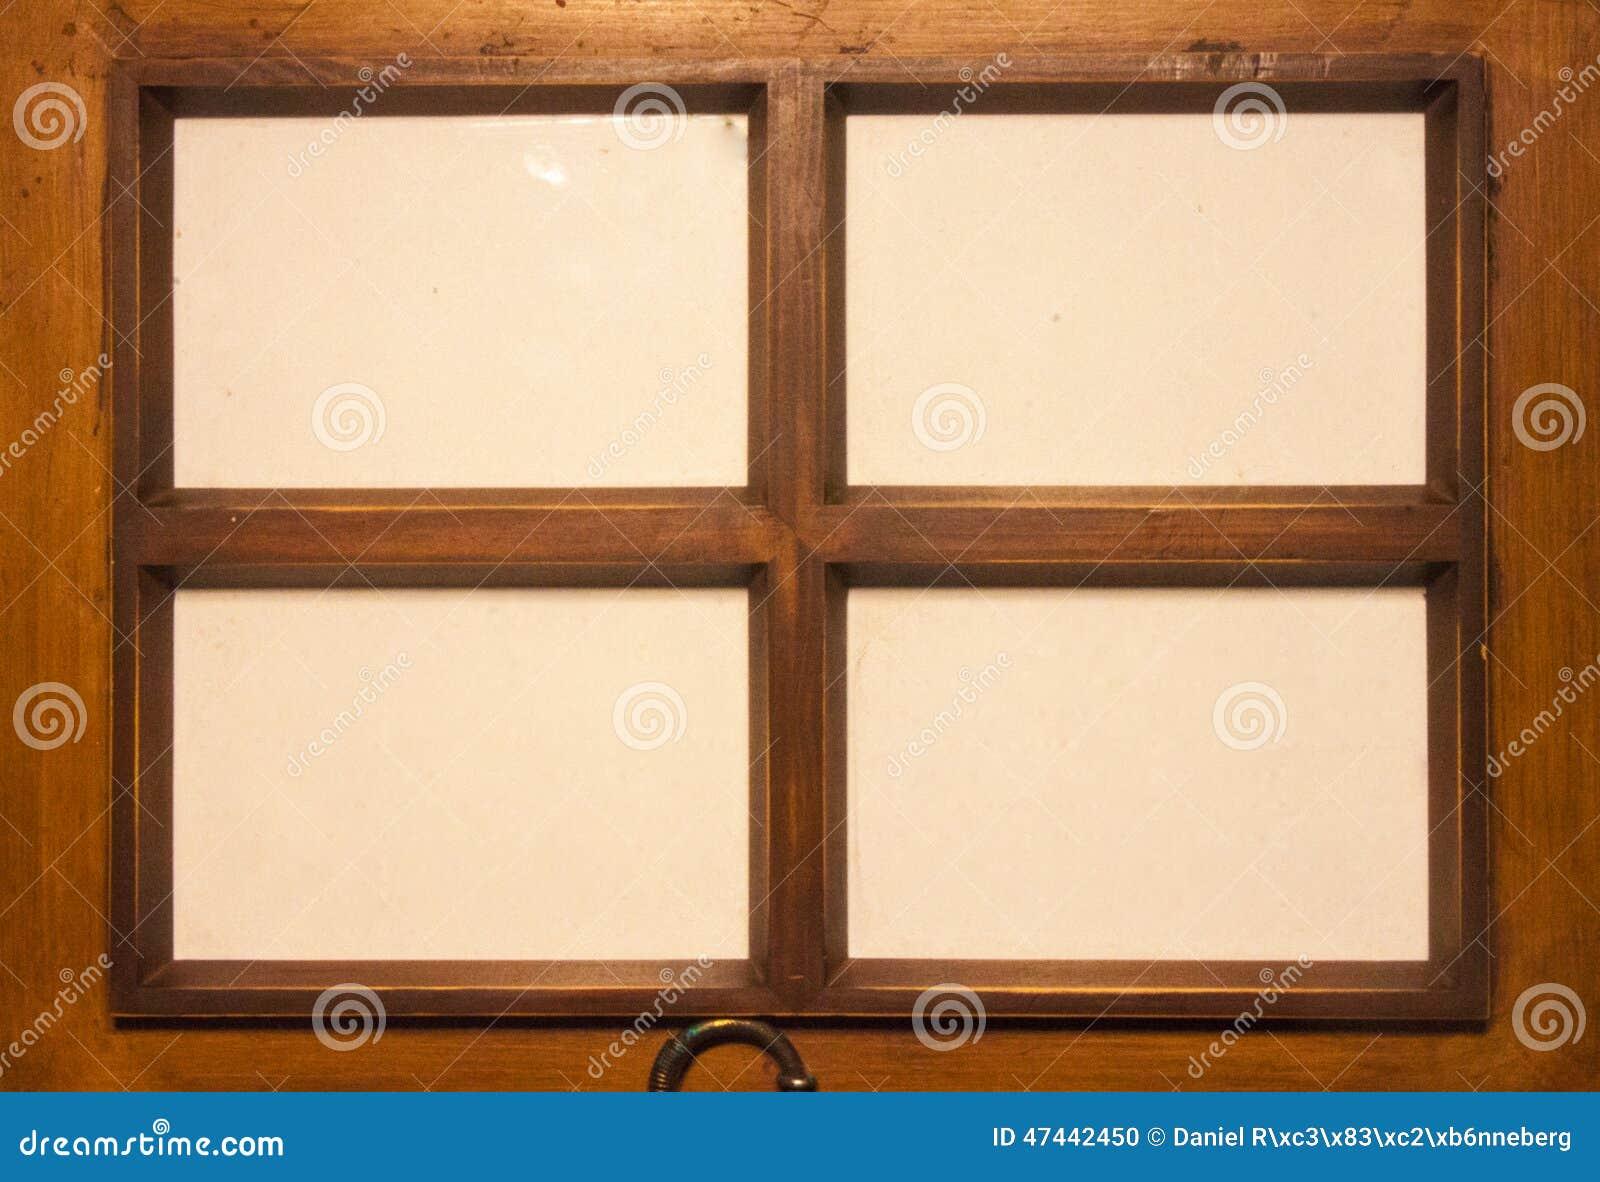 four wooden frames stock photo image of gold space 47442450. Black Bedroom Furniture Sets. Home Design Ideas